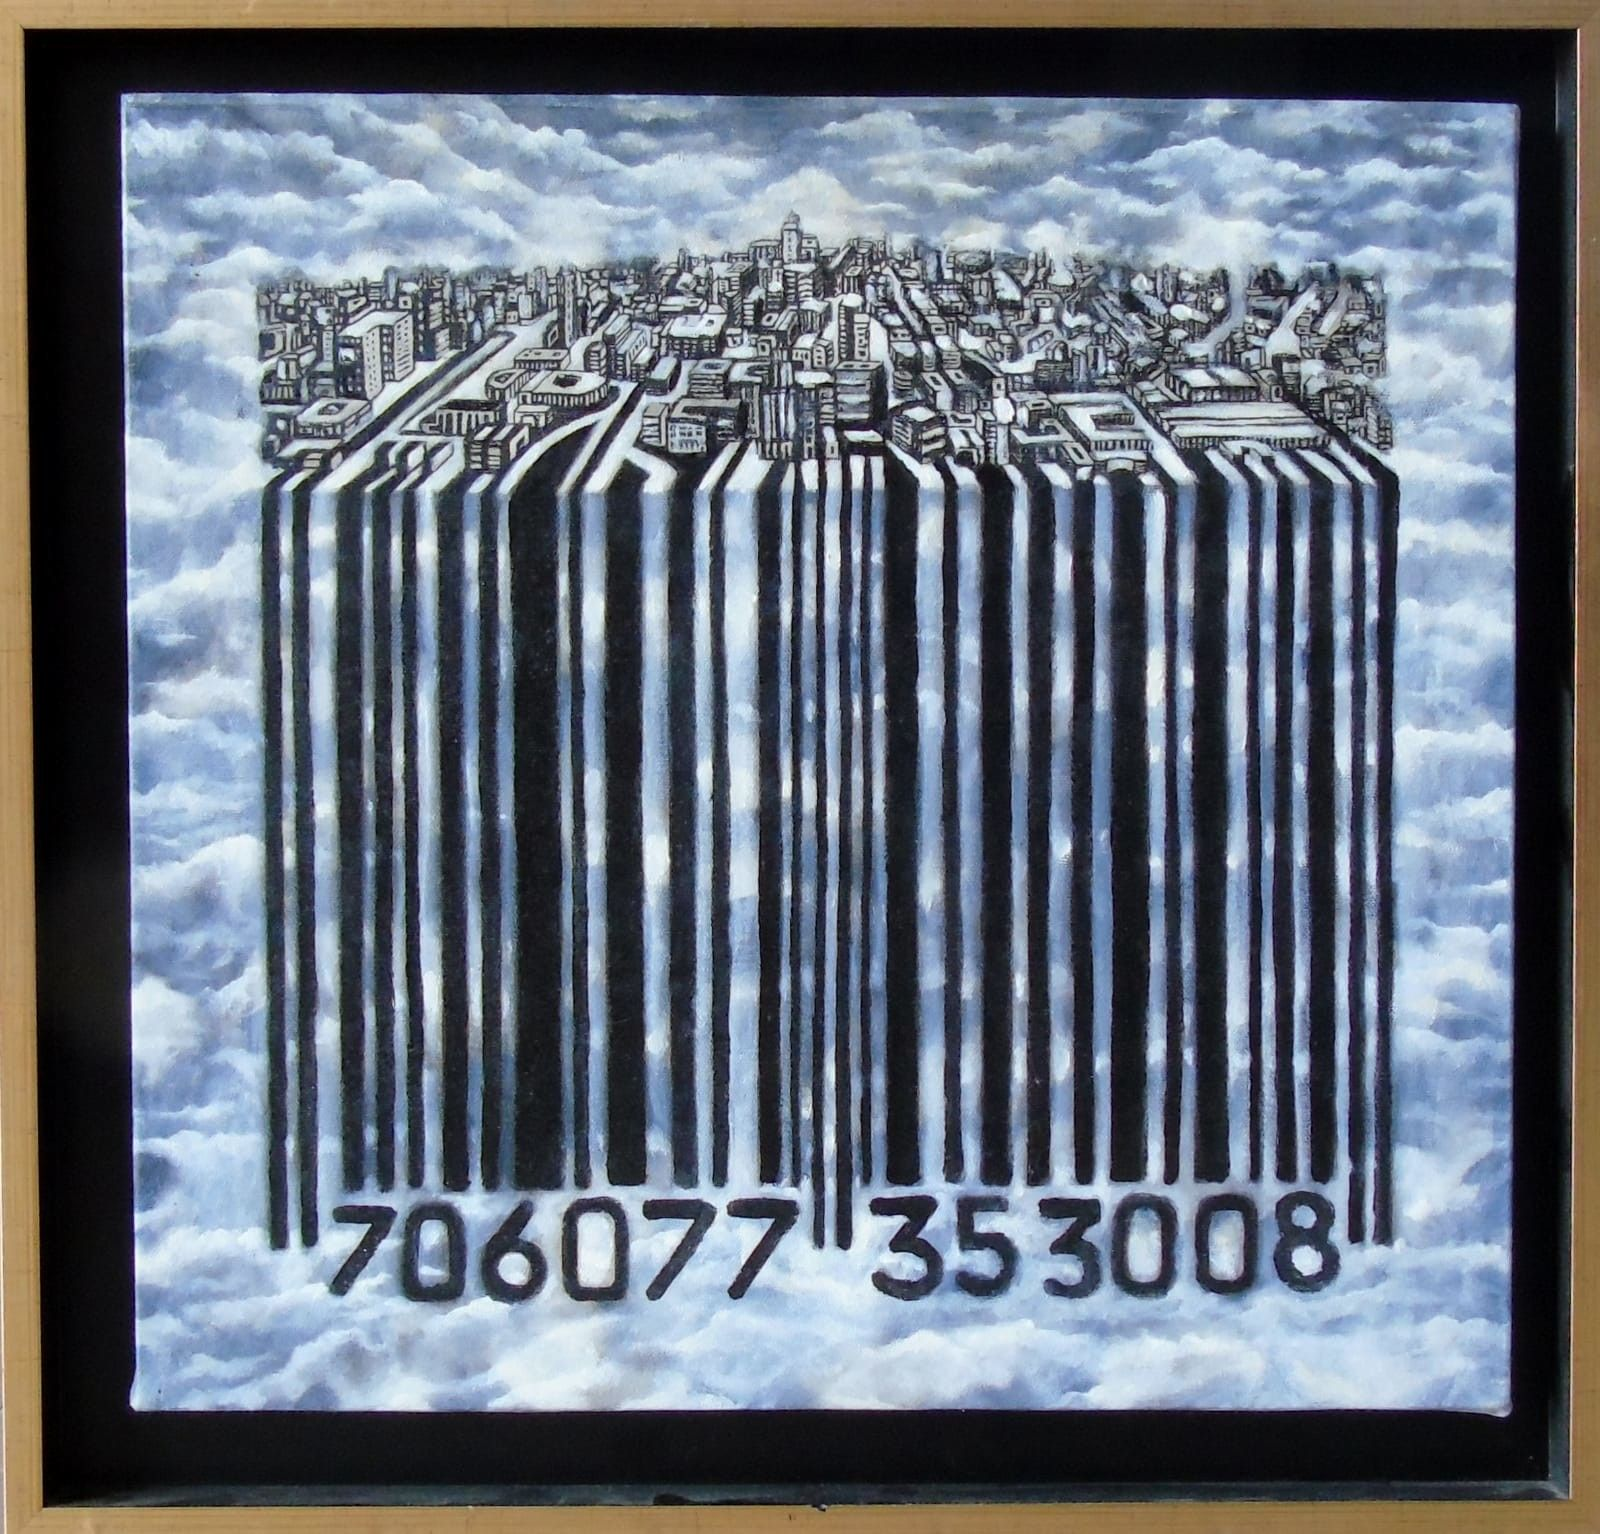 MIXED MEDIA SEBASTIAN DE GOBBIS ' CODECITY@NEBULOSA '  dimensioni L 53 x H 51 cm.